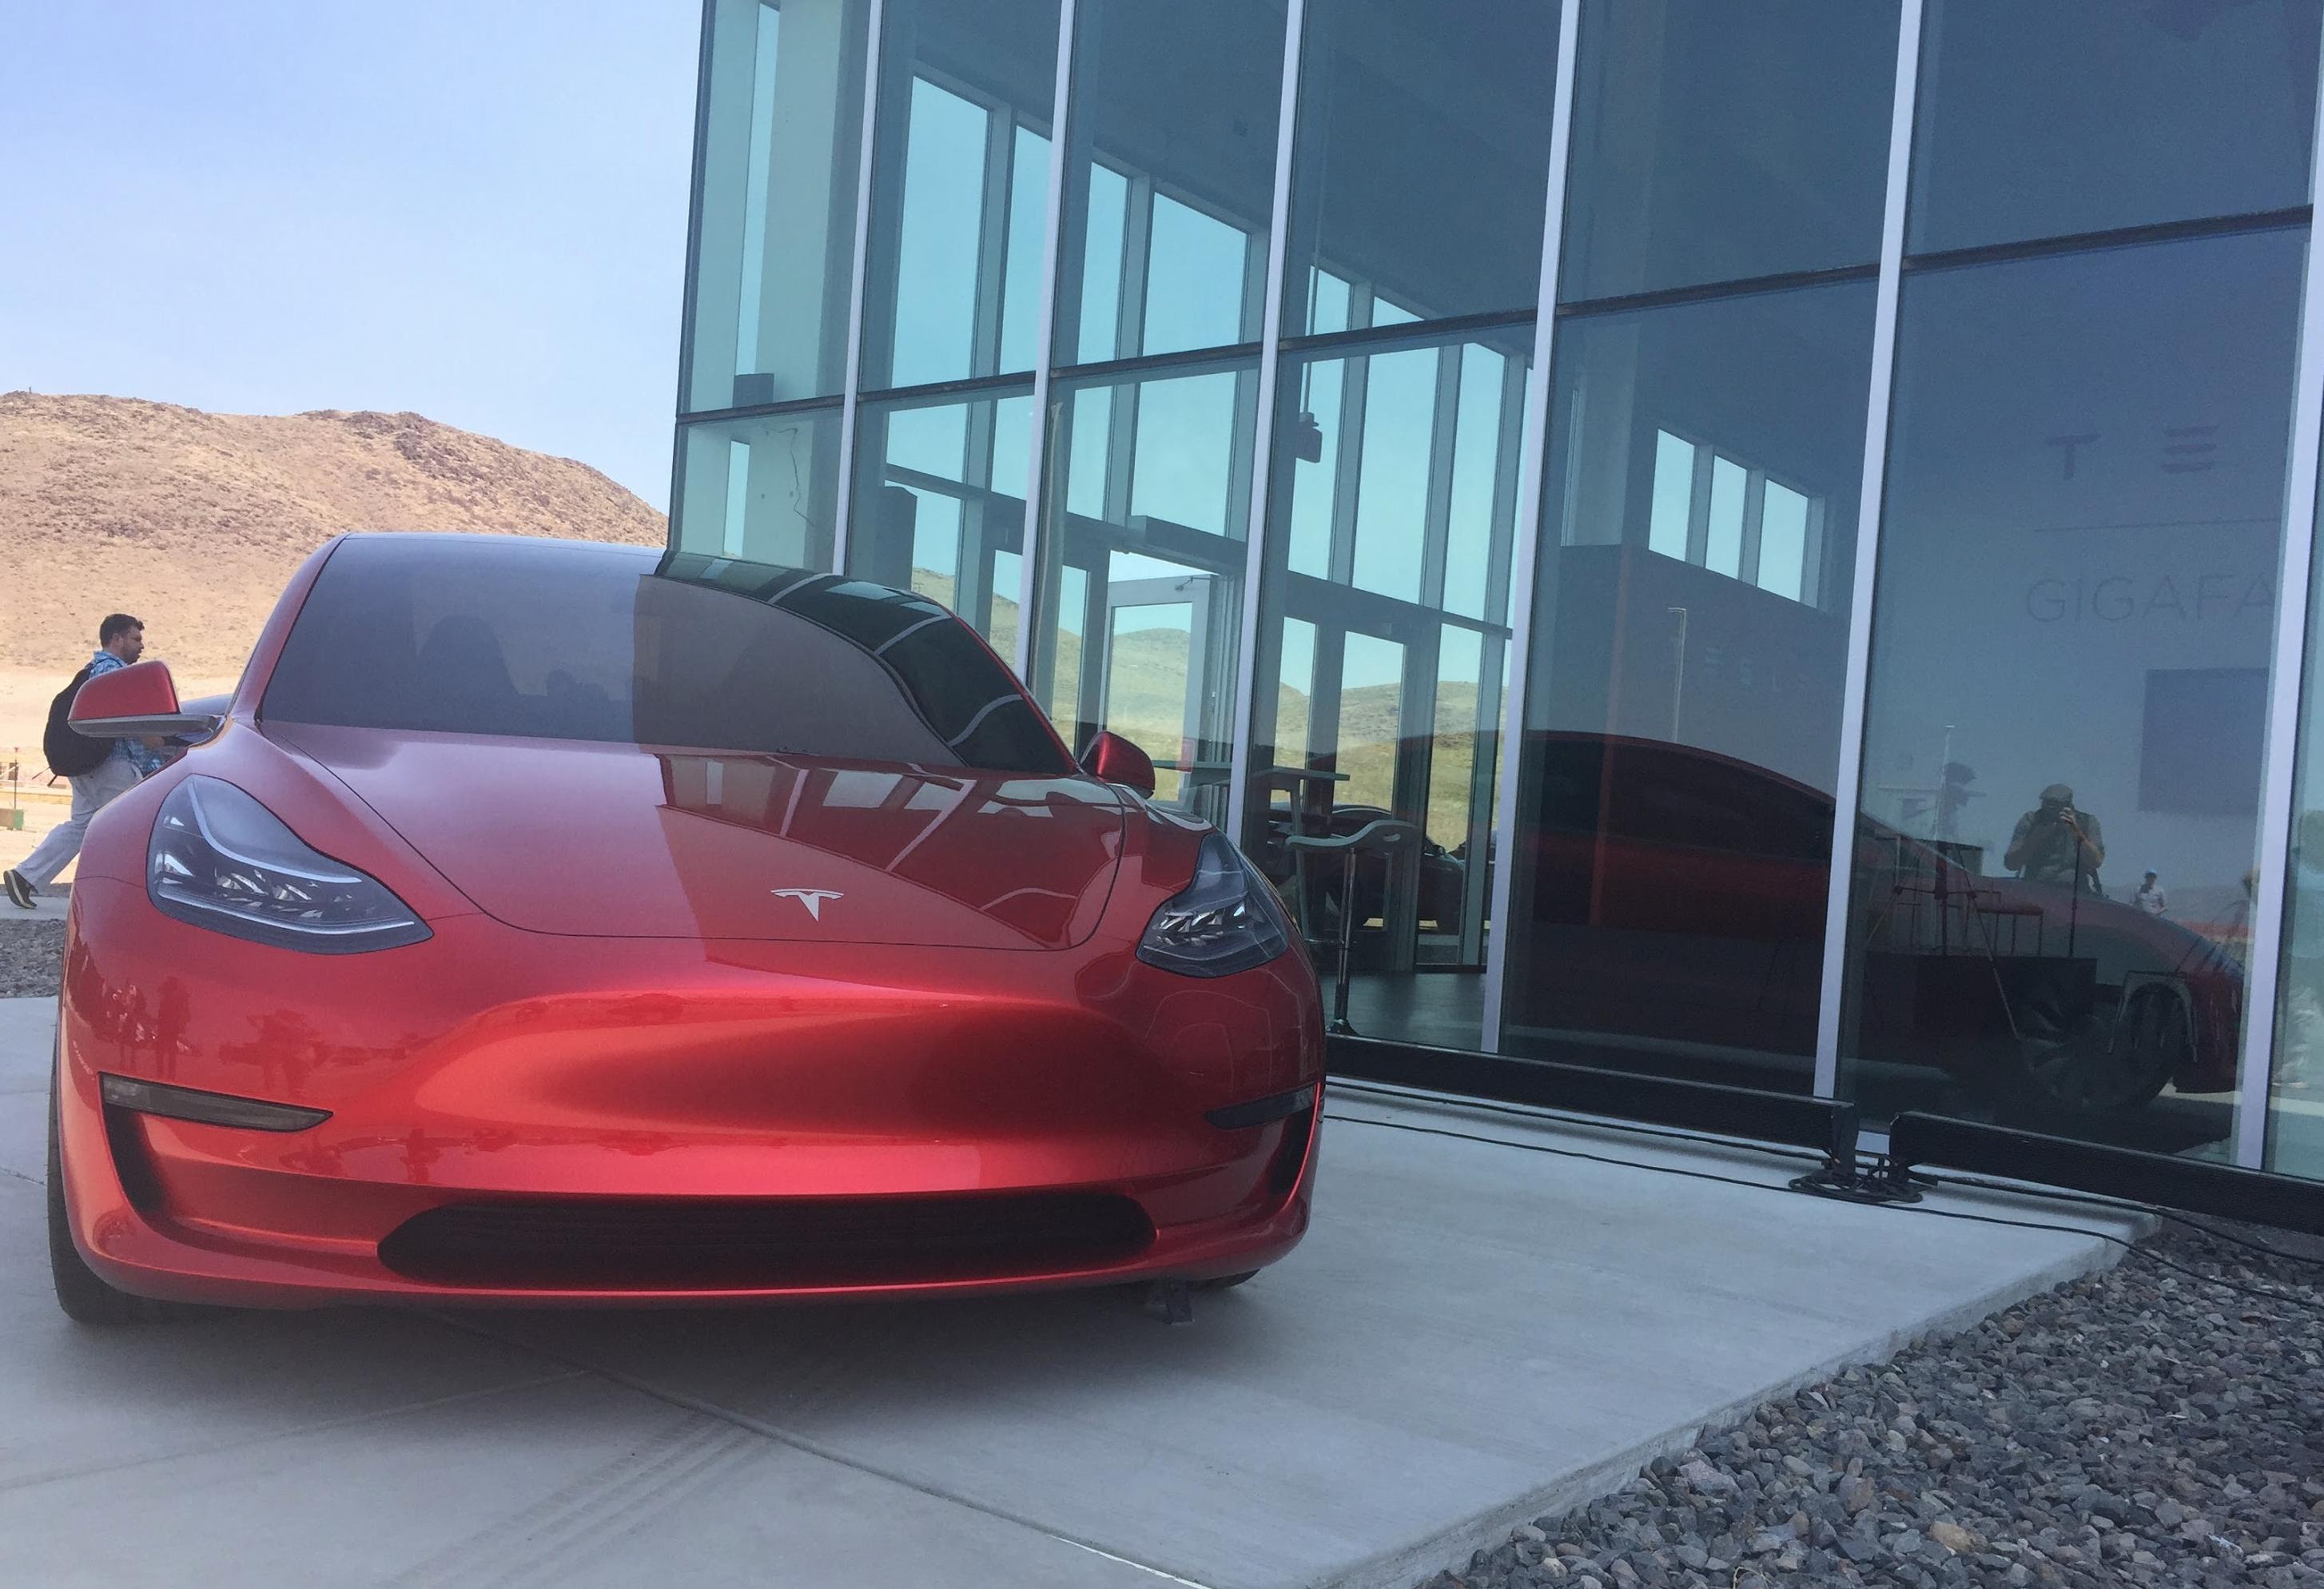 Model 3 prototype at Tesla's Gigafactory in Nevada